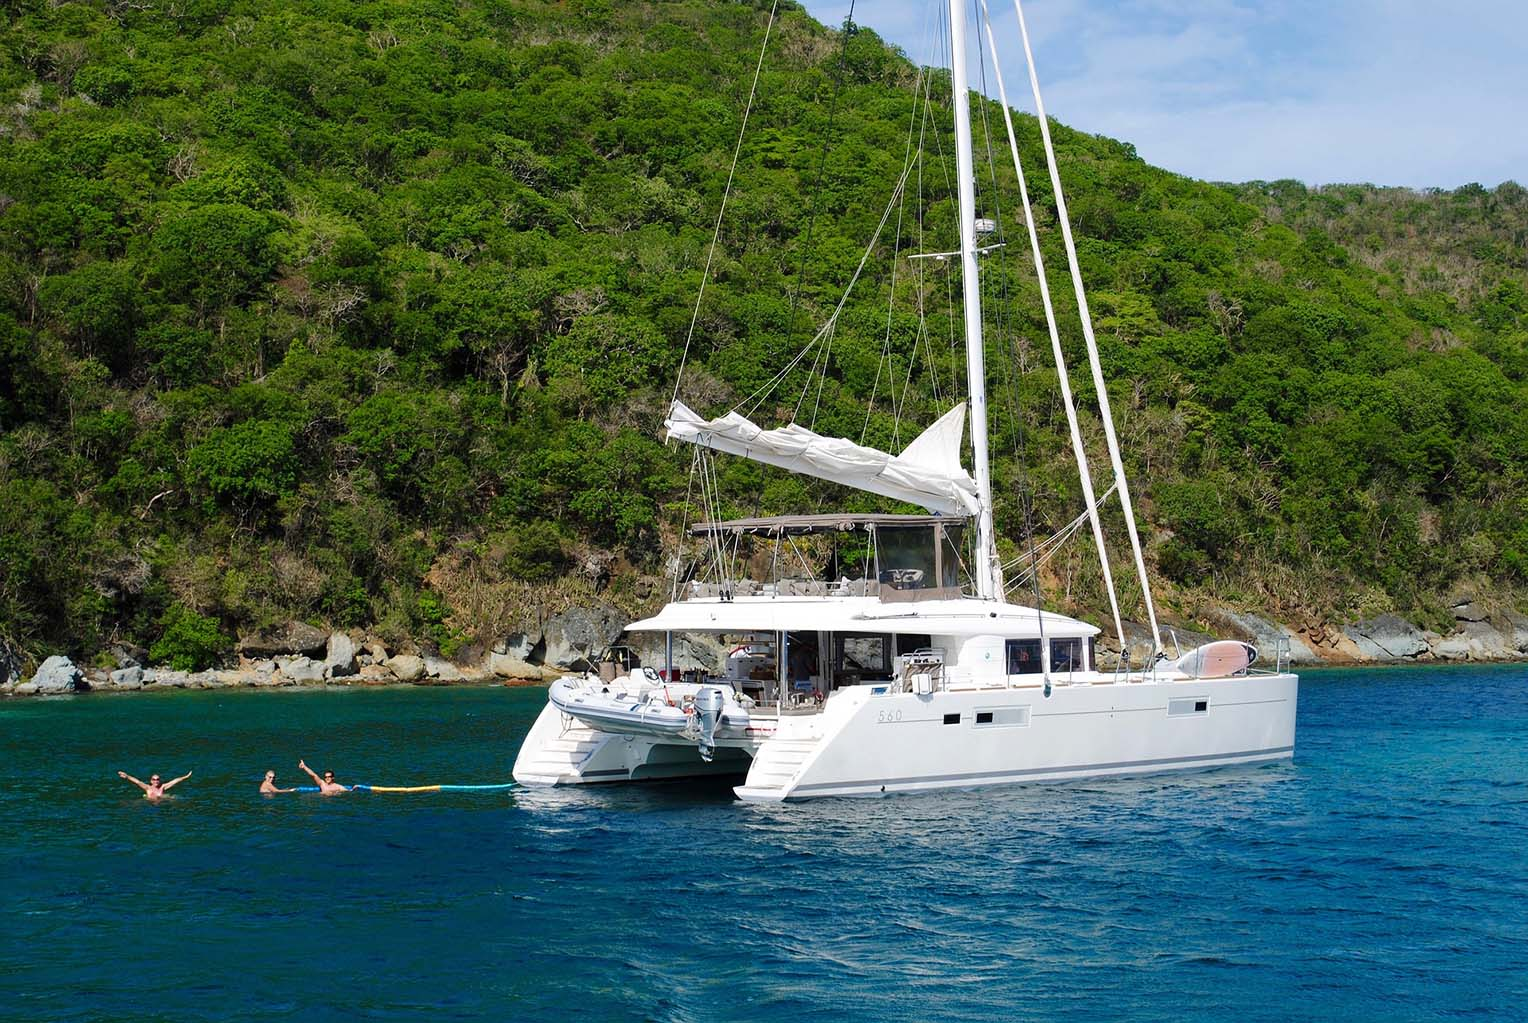 Katamaraani purjevene Kroatia